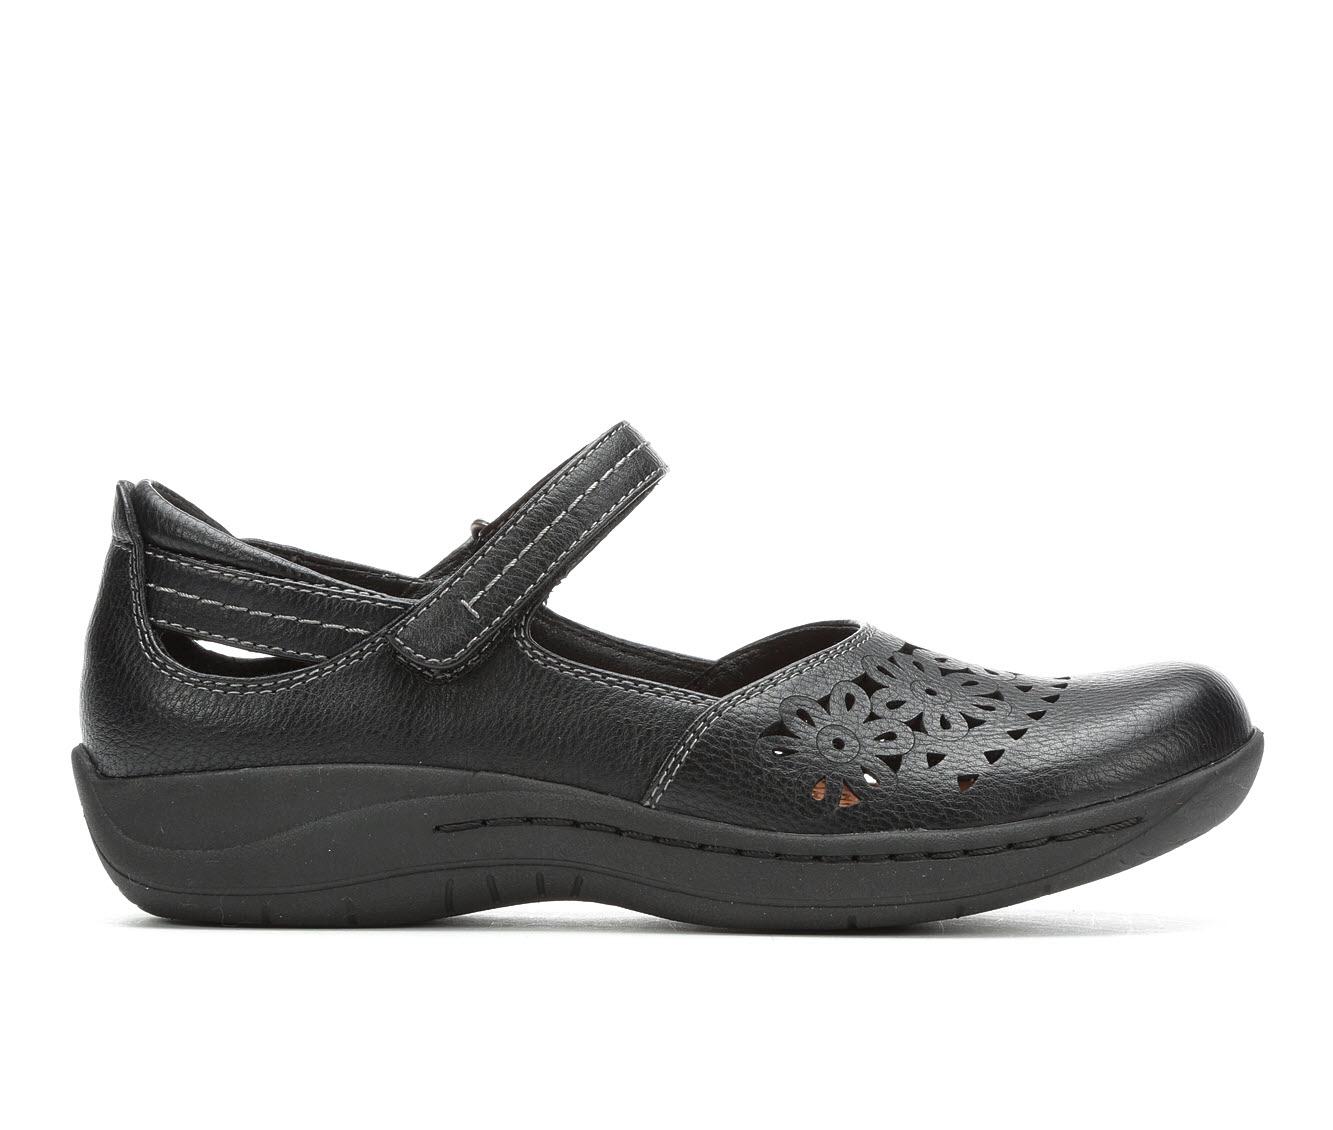 Baretraps Jennings Women's Shoe (Black Faux Leather)